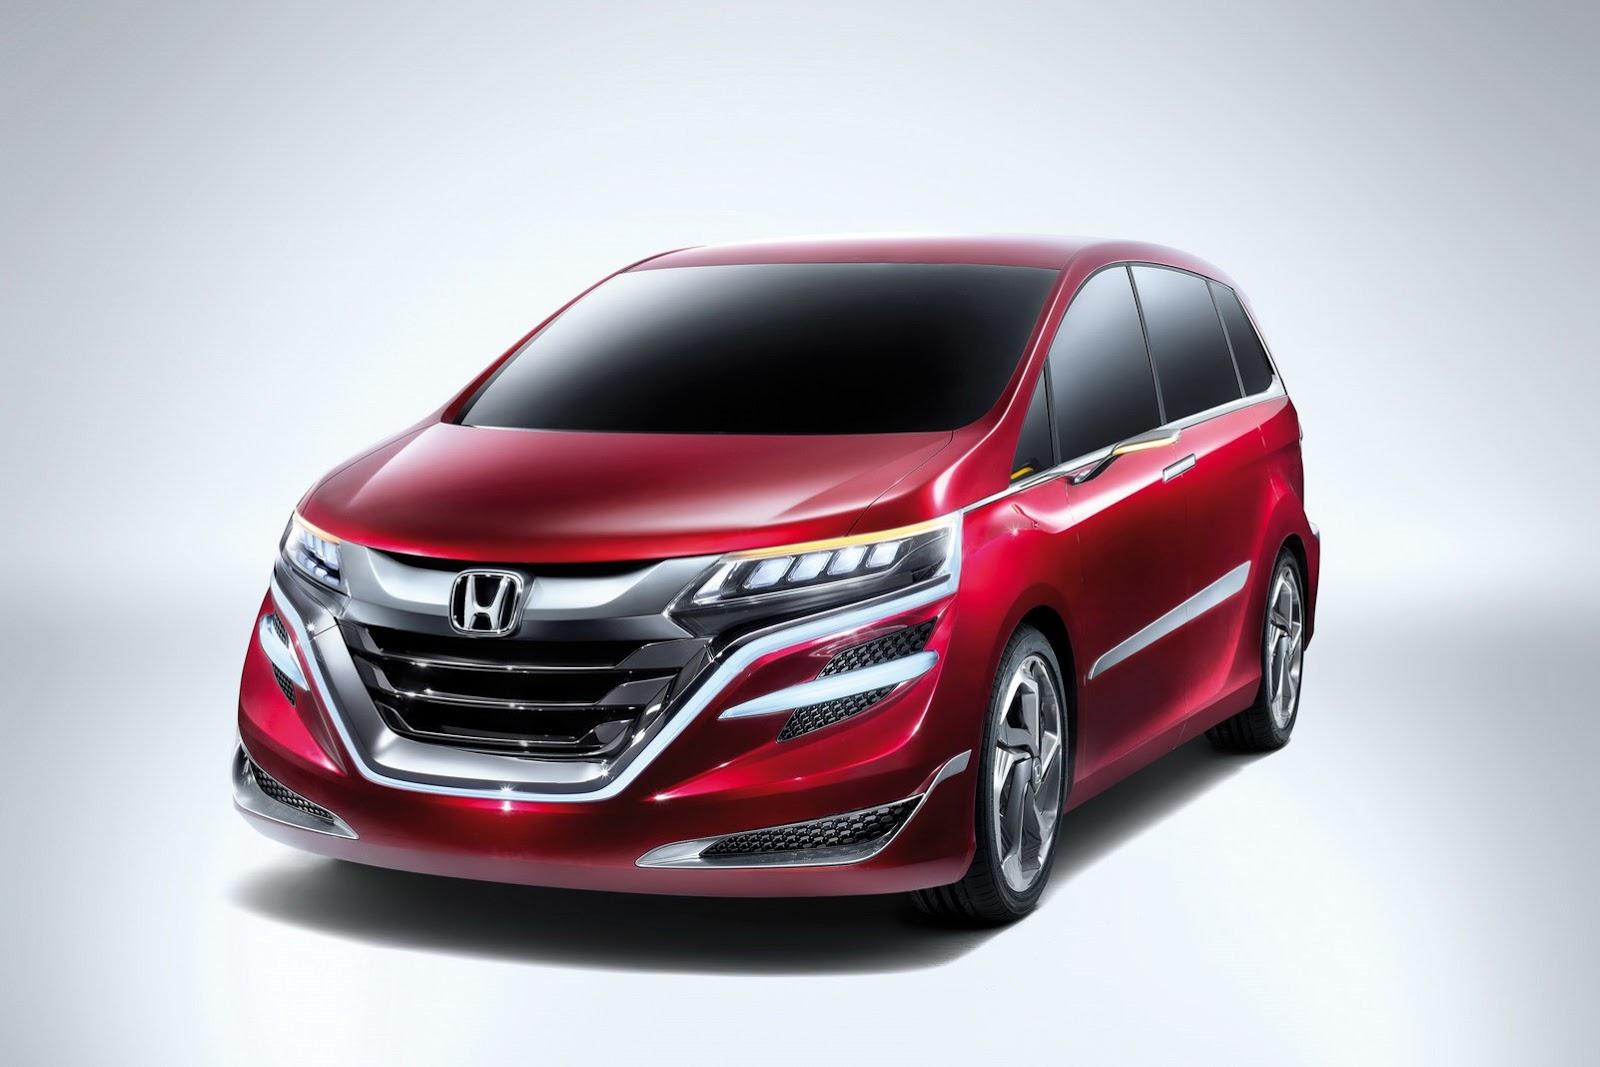 Http www carscoops com 2013 04 honda proposes new concept m minivan to html